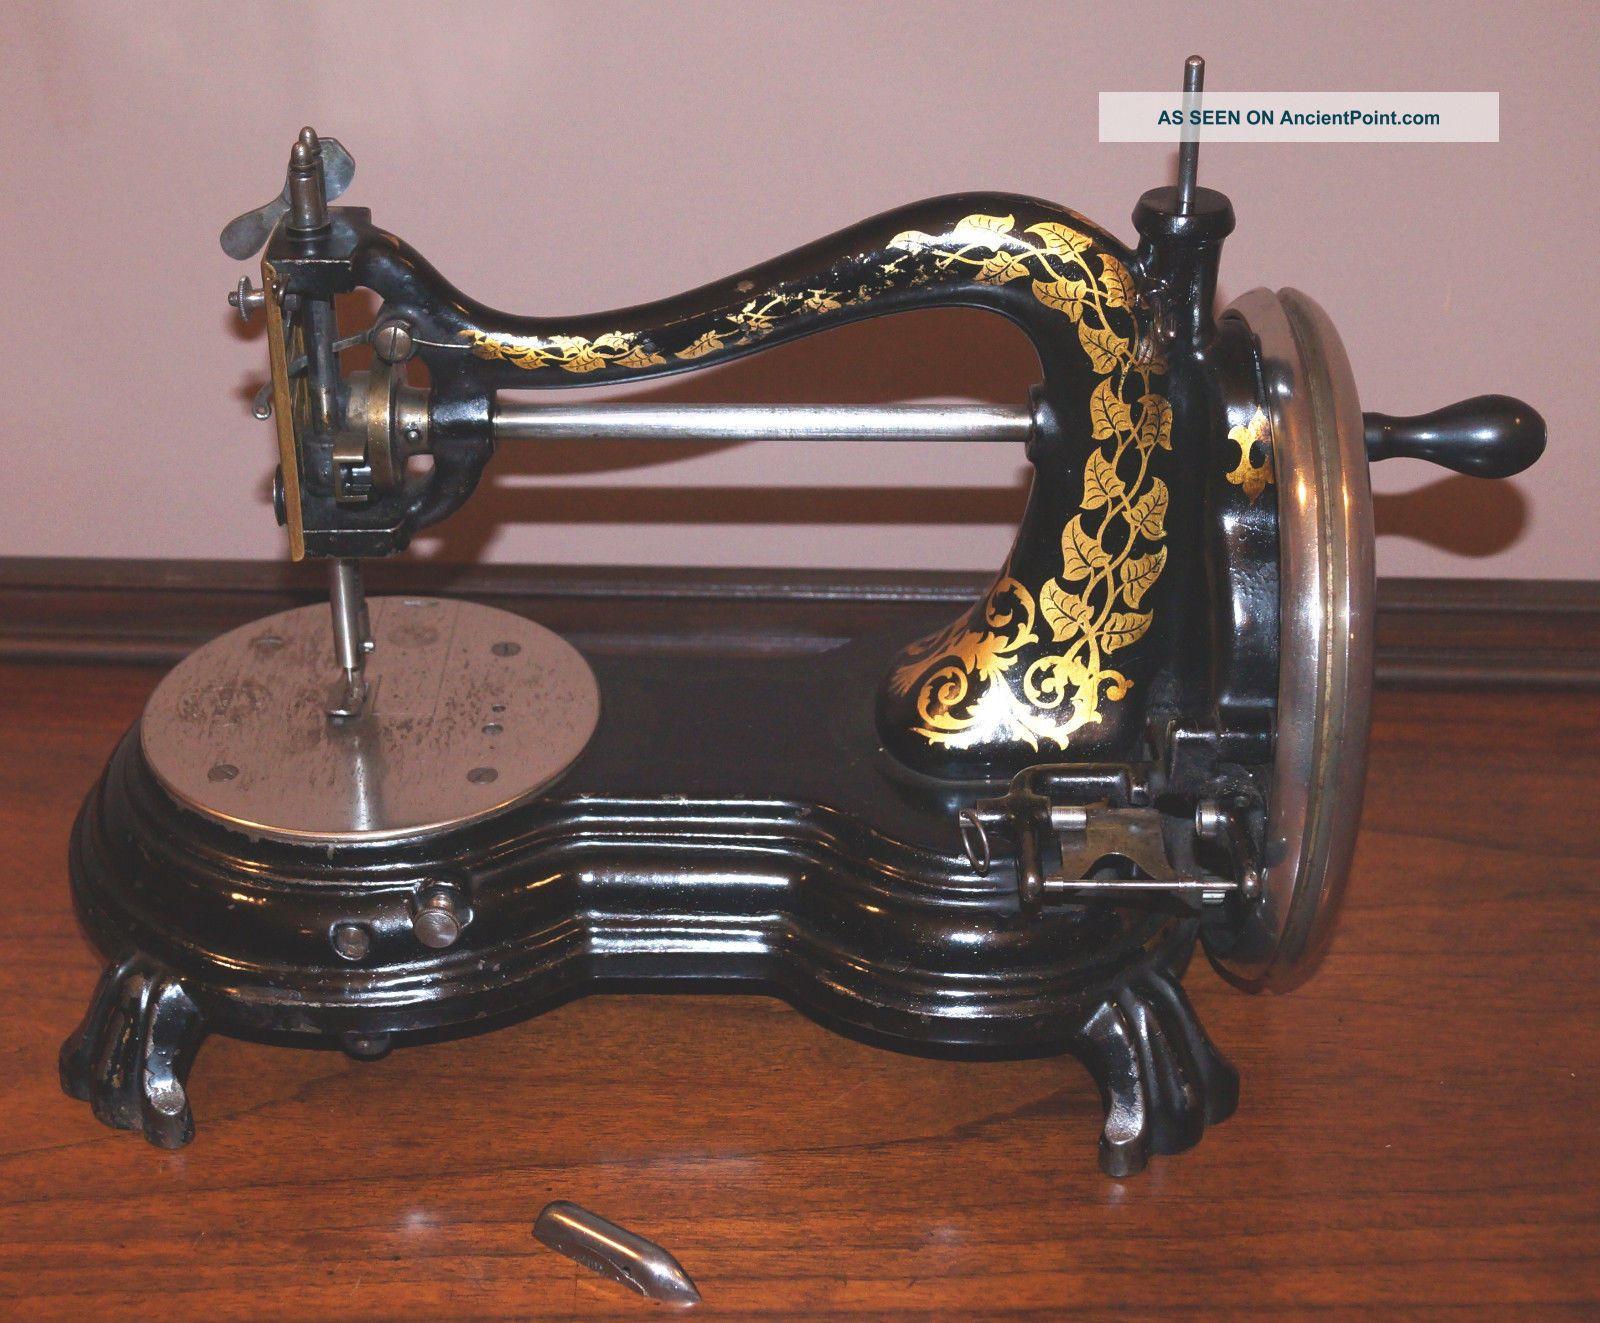 Antique Jones Hand Crank Serpentine Claw Foot Sewing Machine Great Decals Sewing Machines photo